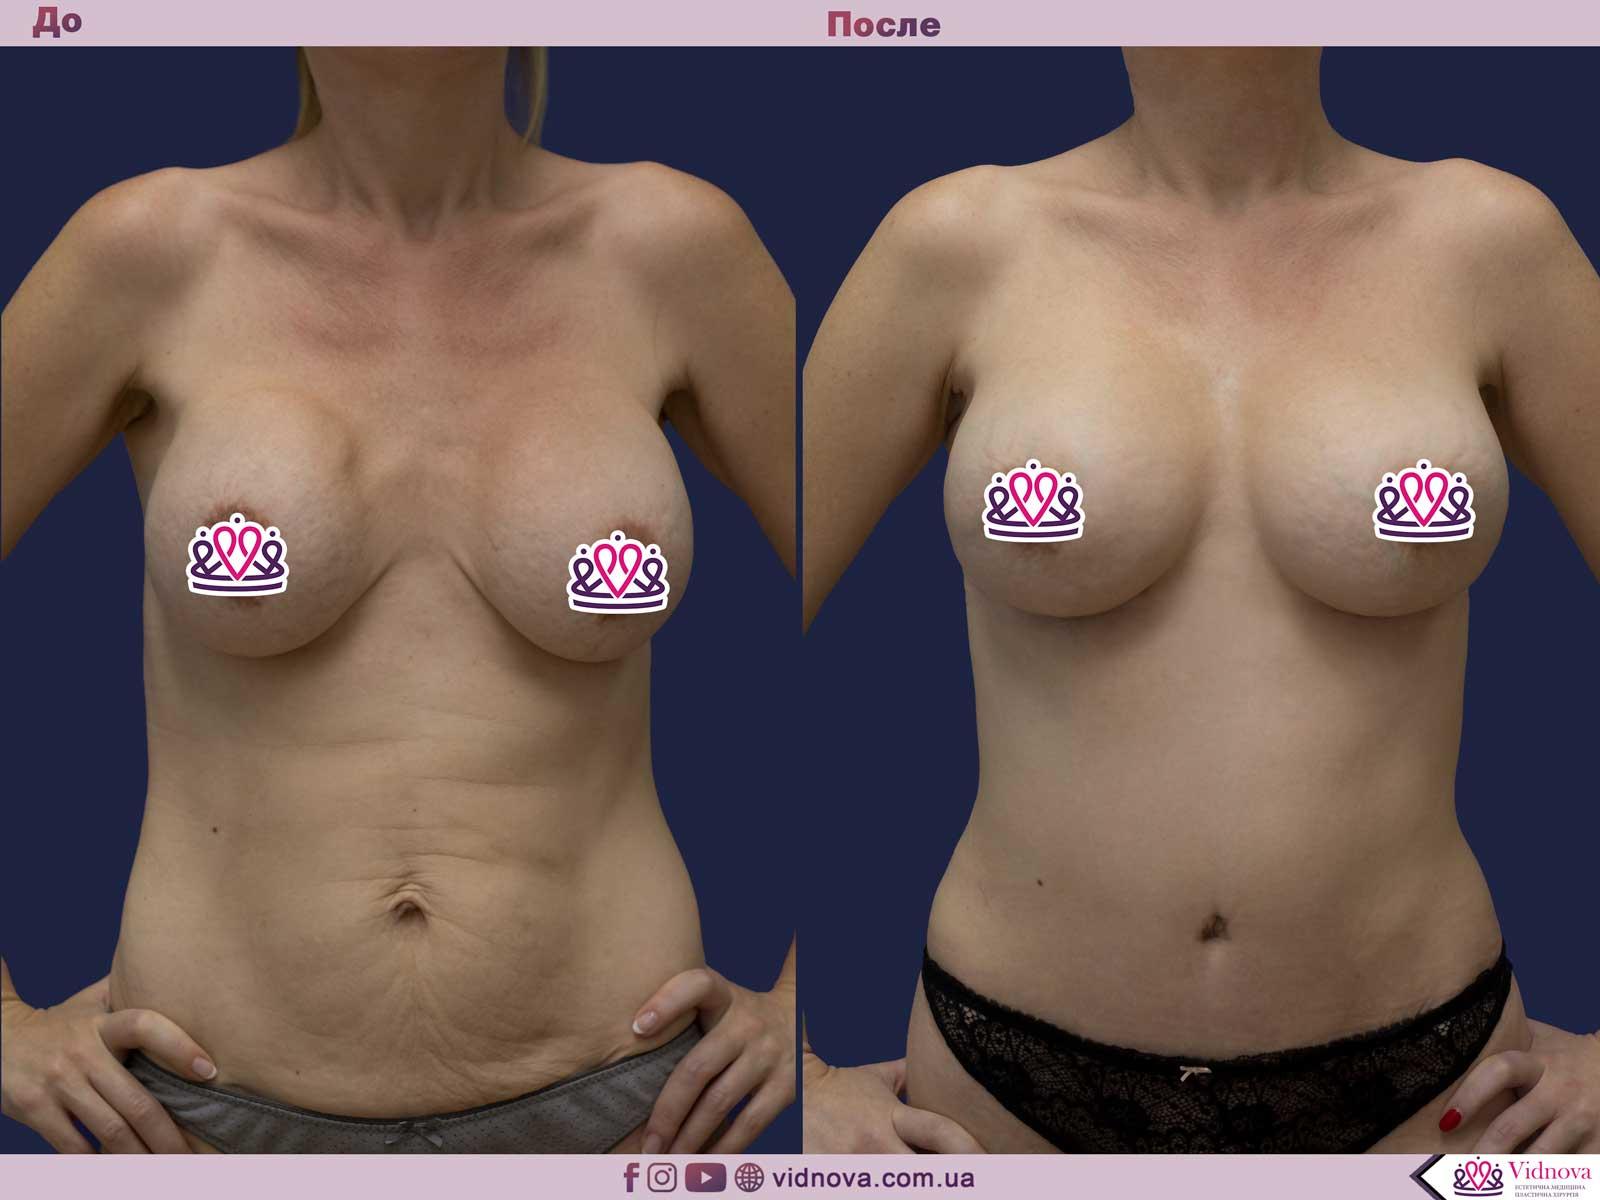 Увеличение груди: Фото ДО и ПОСЛЕ - Пример №82-1 - Клиника Vidnova